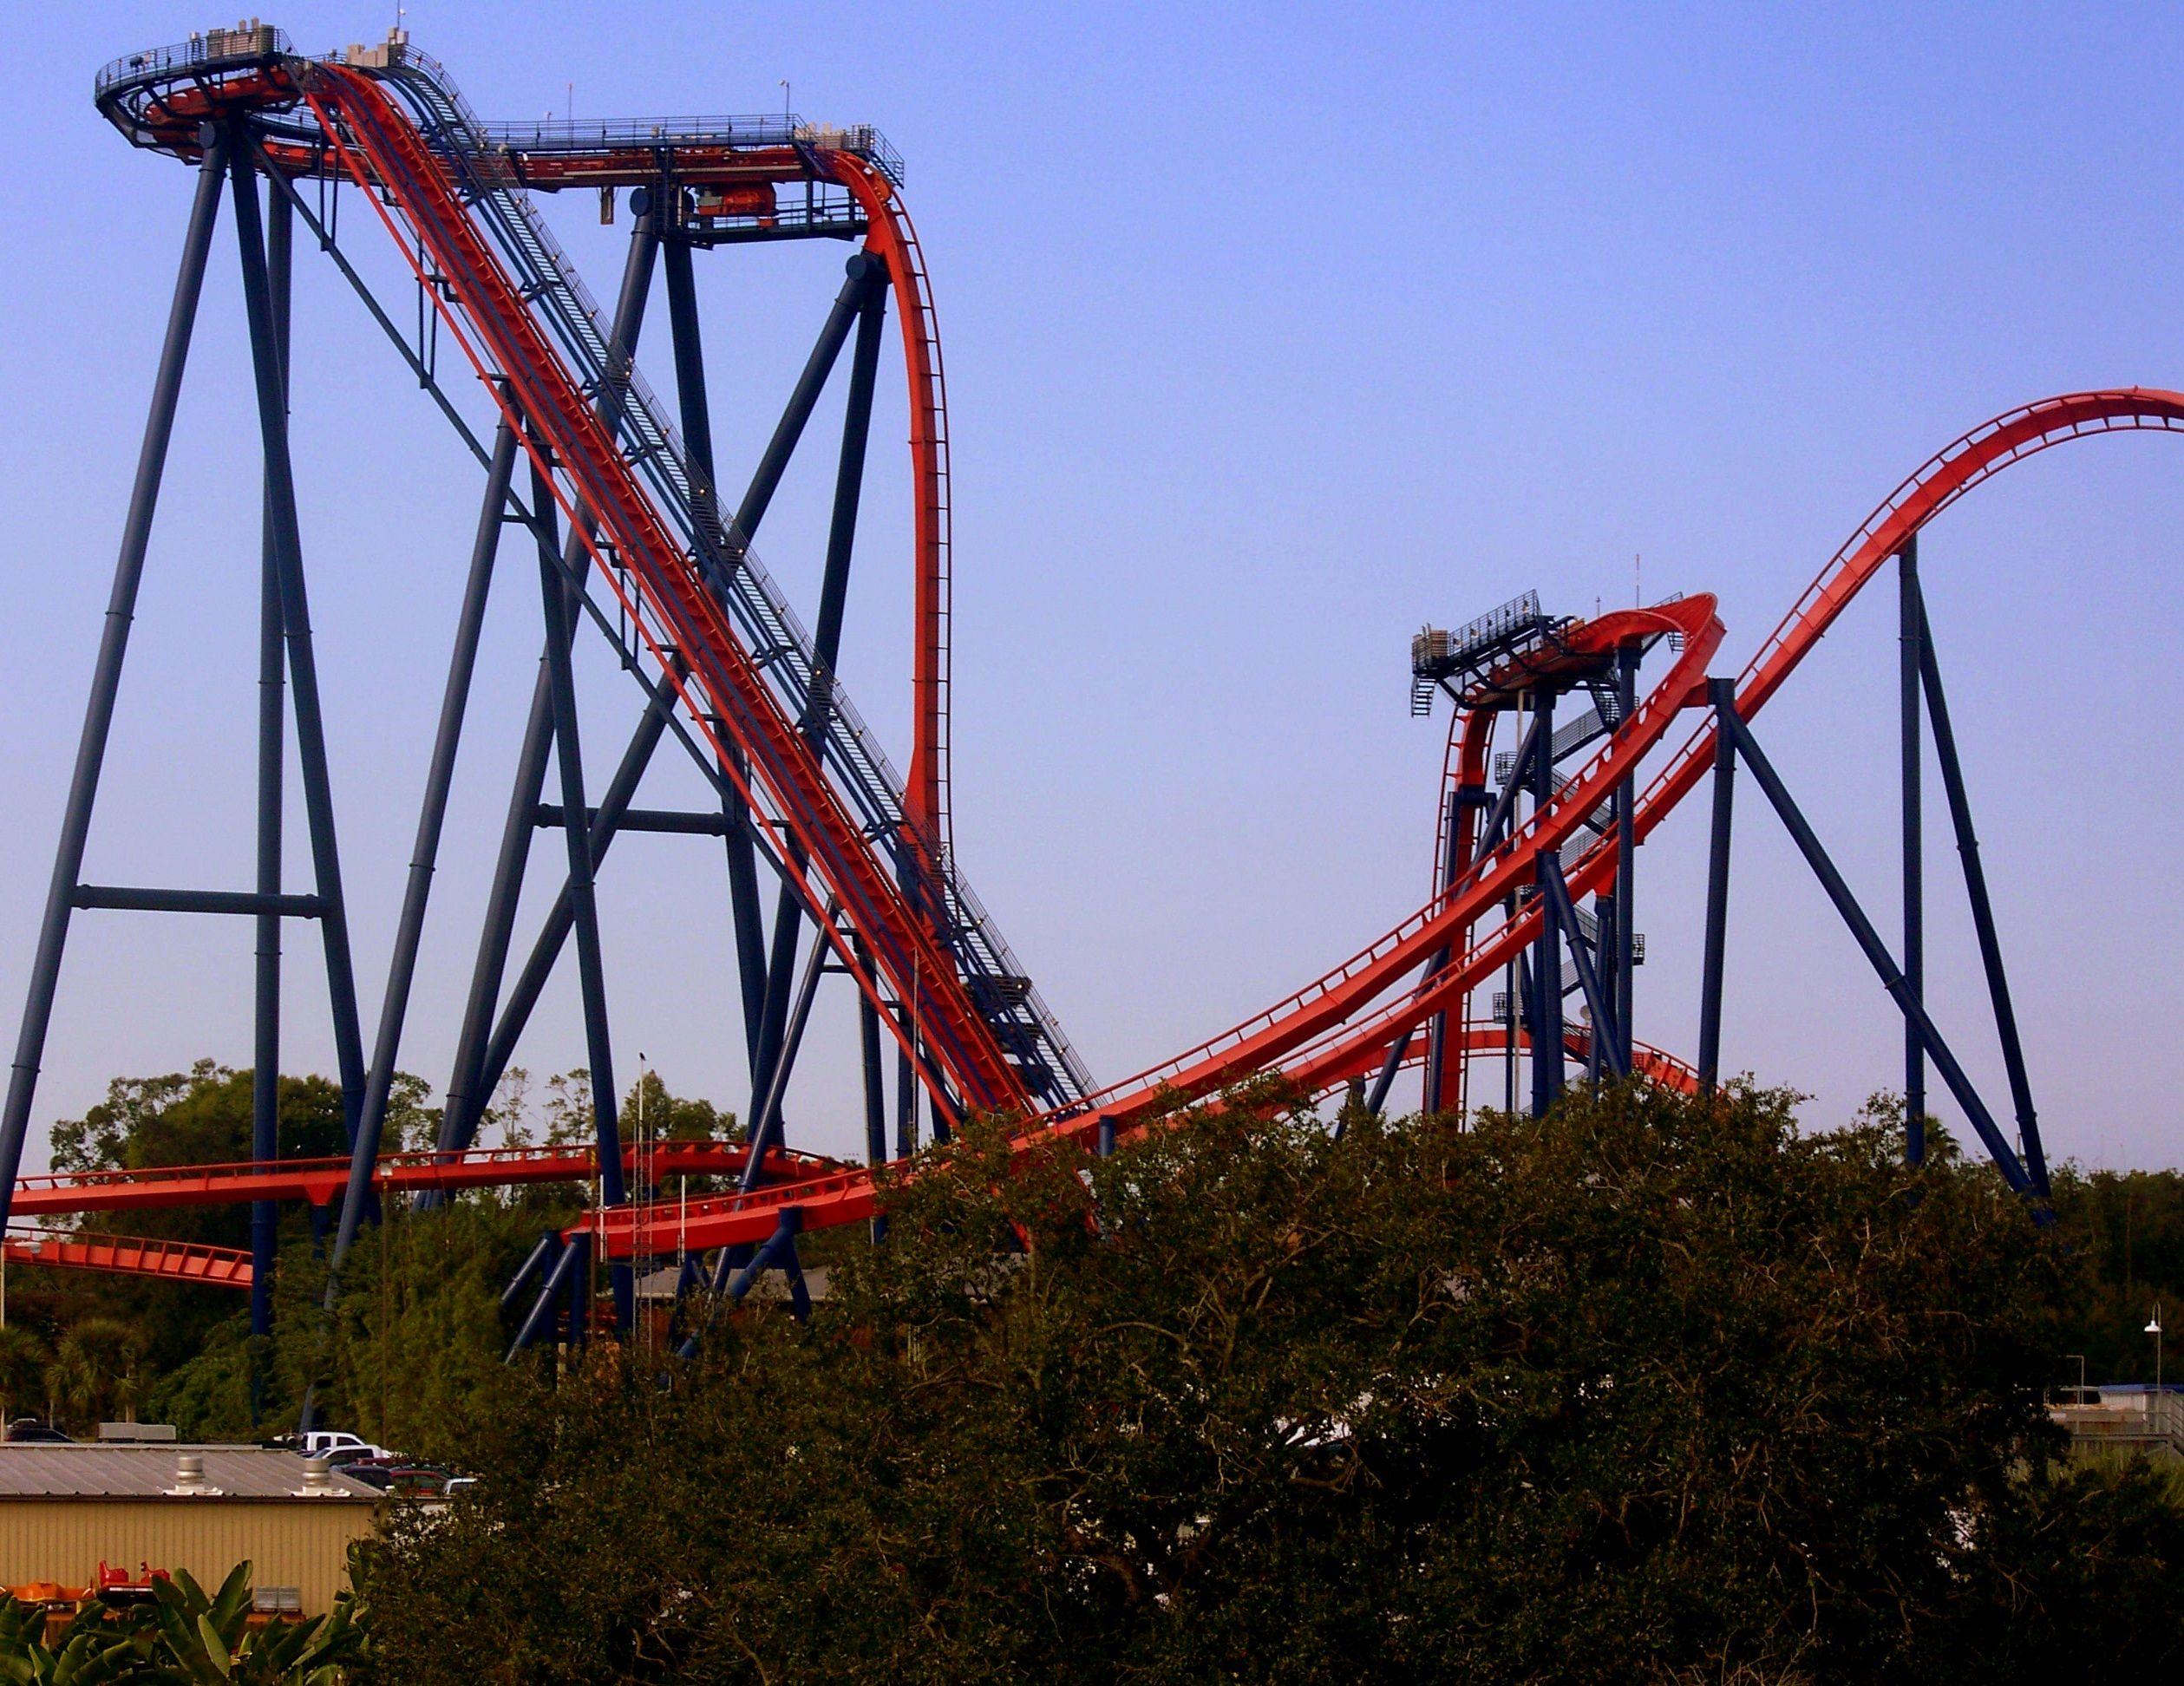 9f3bff7ab96daafcd0530fe304c85ce1 - Is The Safari Included In Busch Gardens